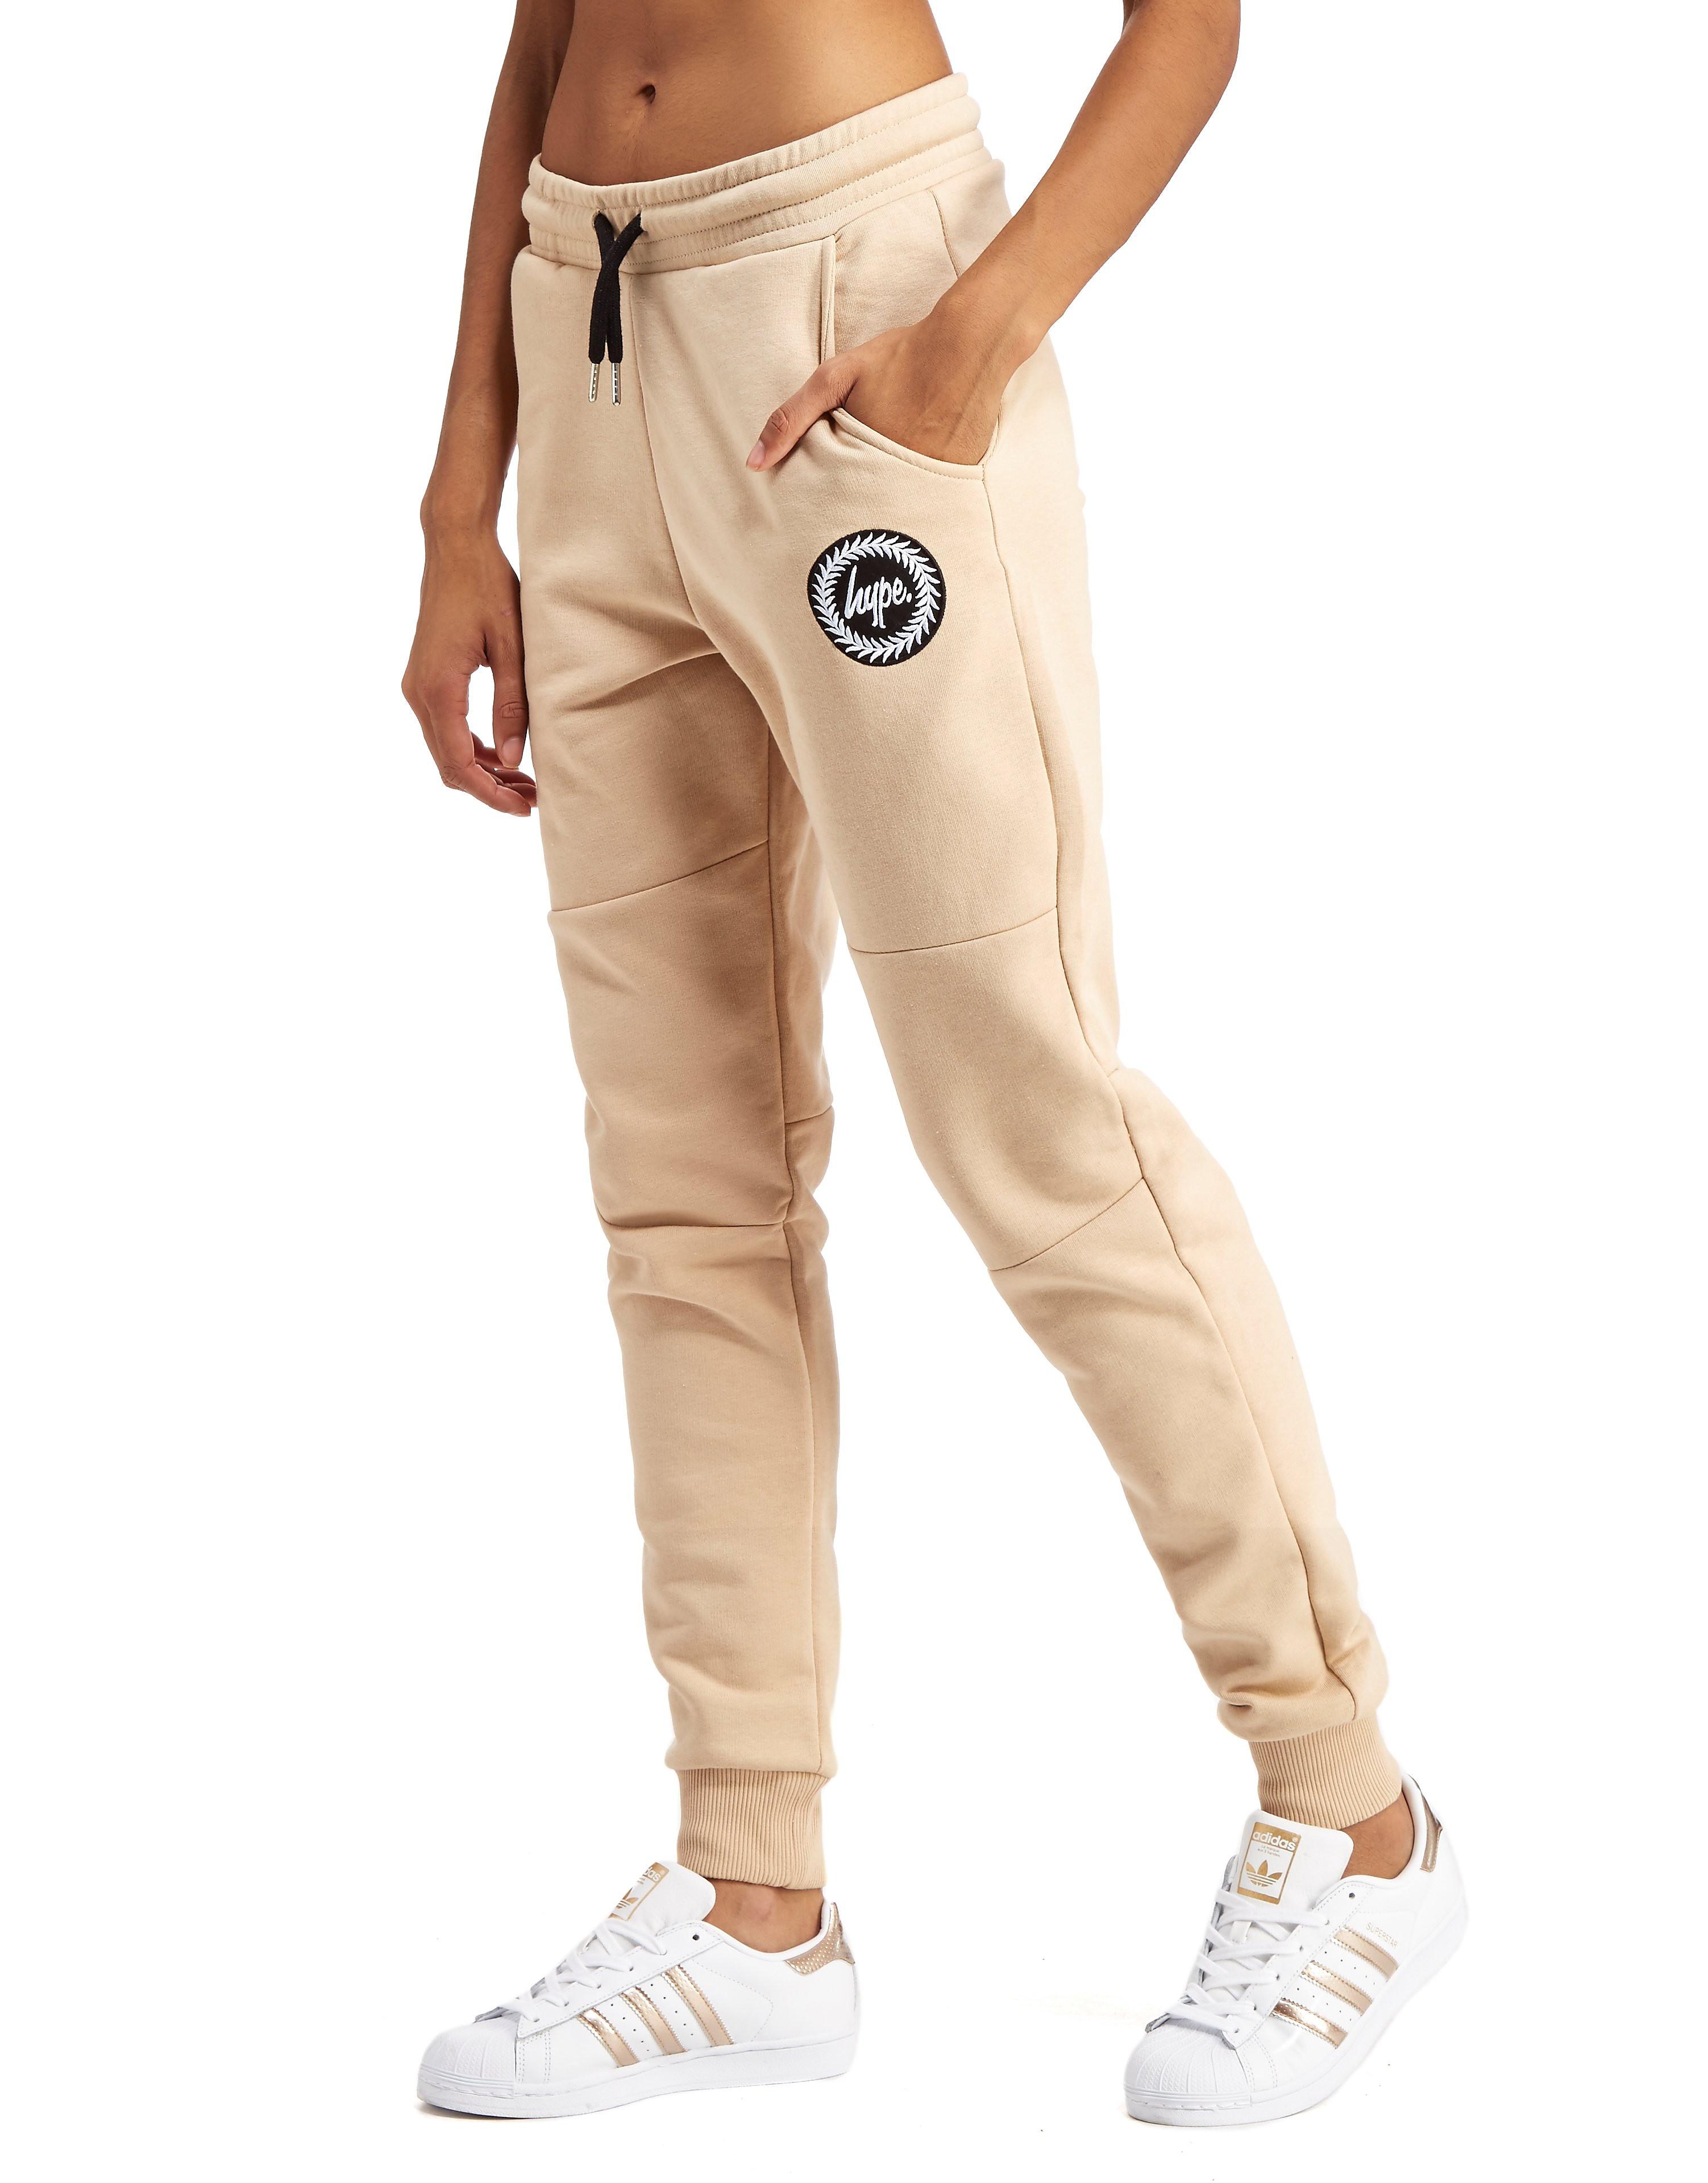 Hype Patch Fleece Pants